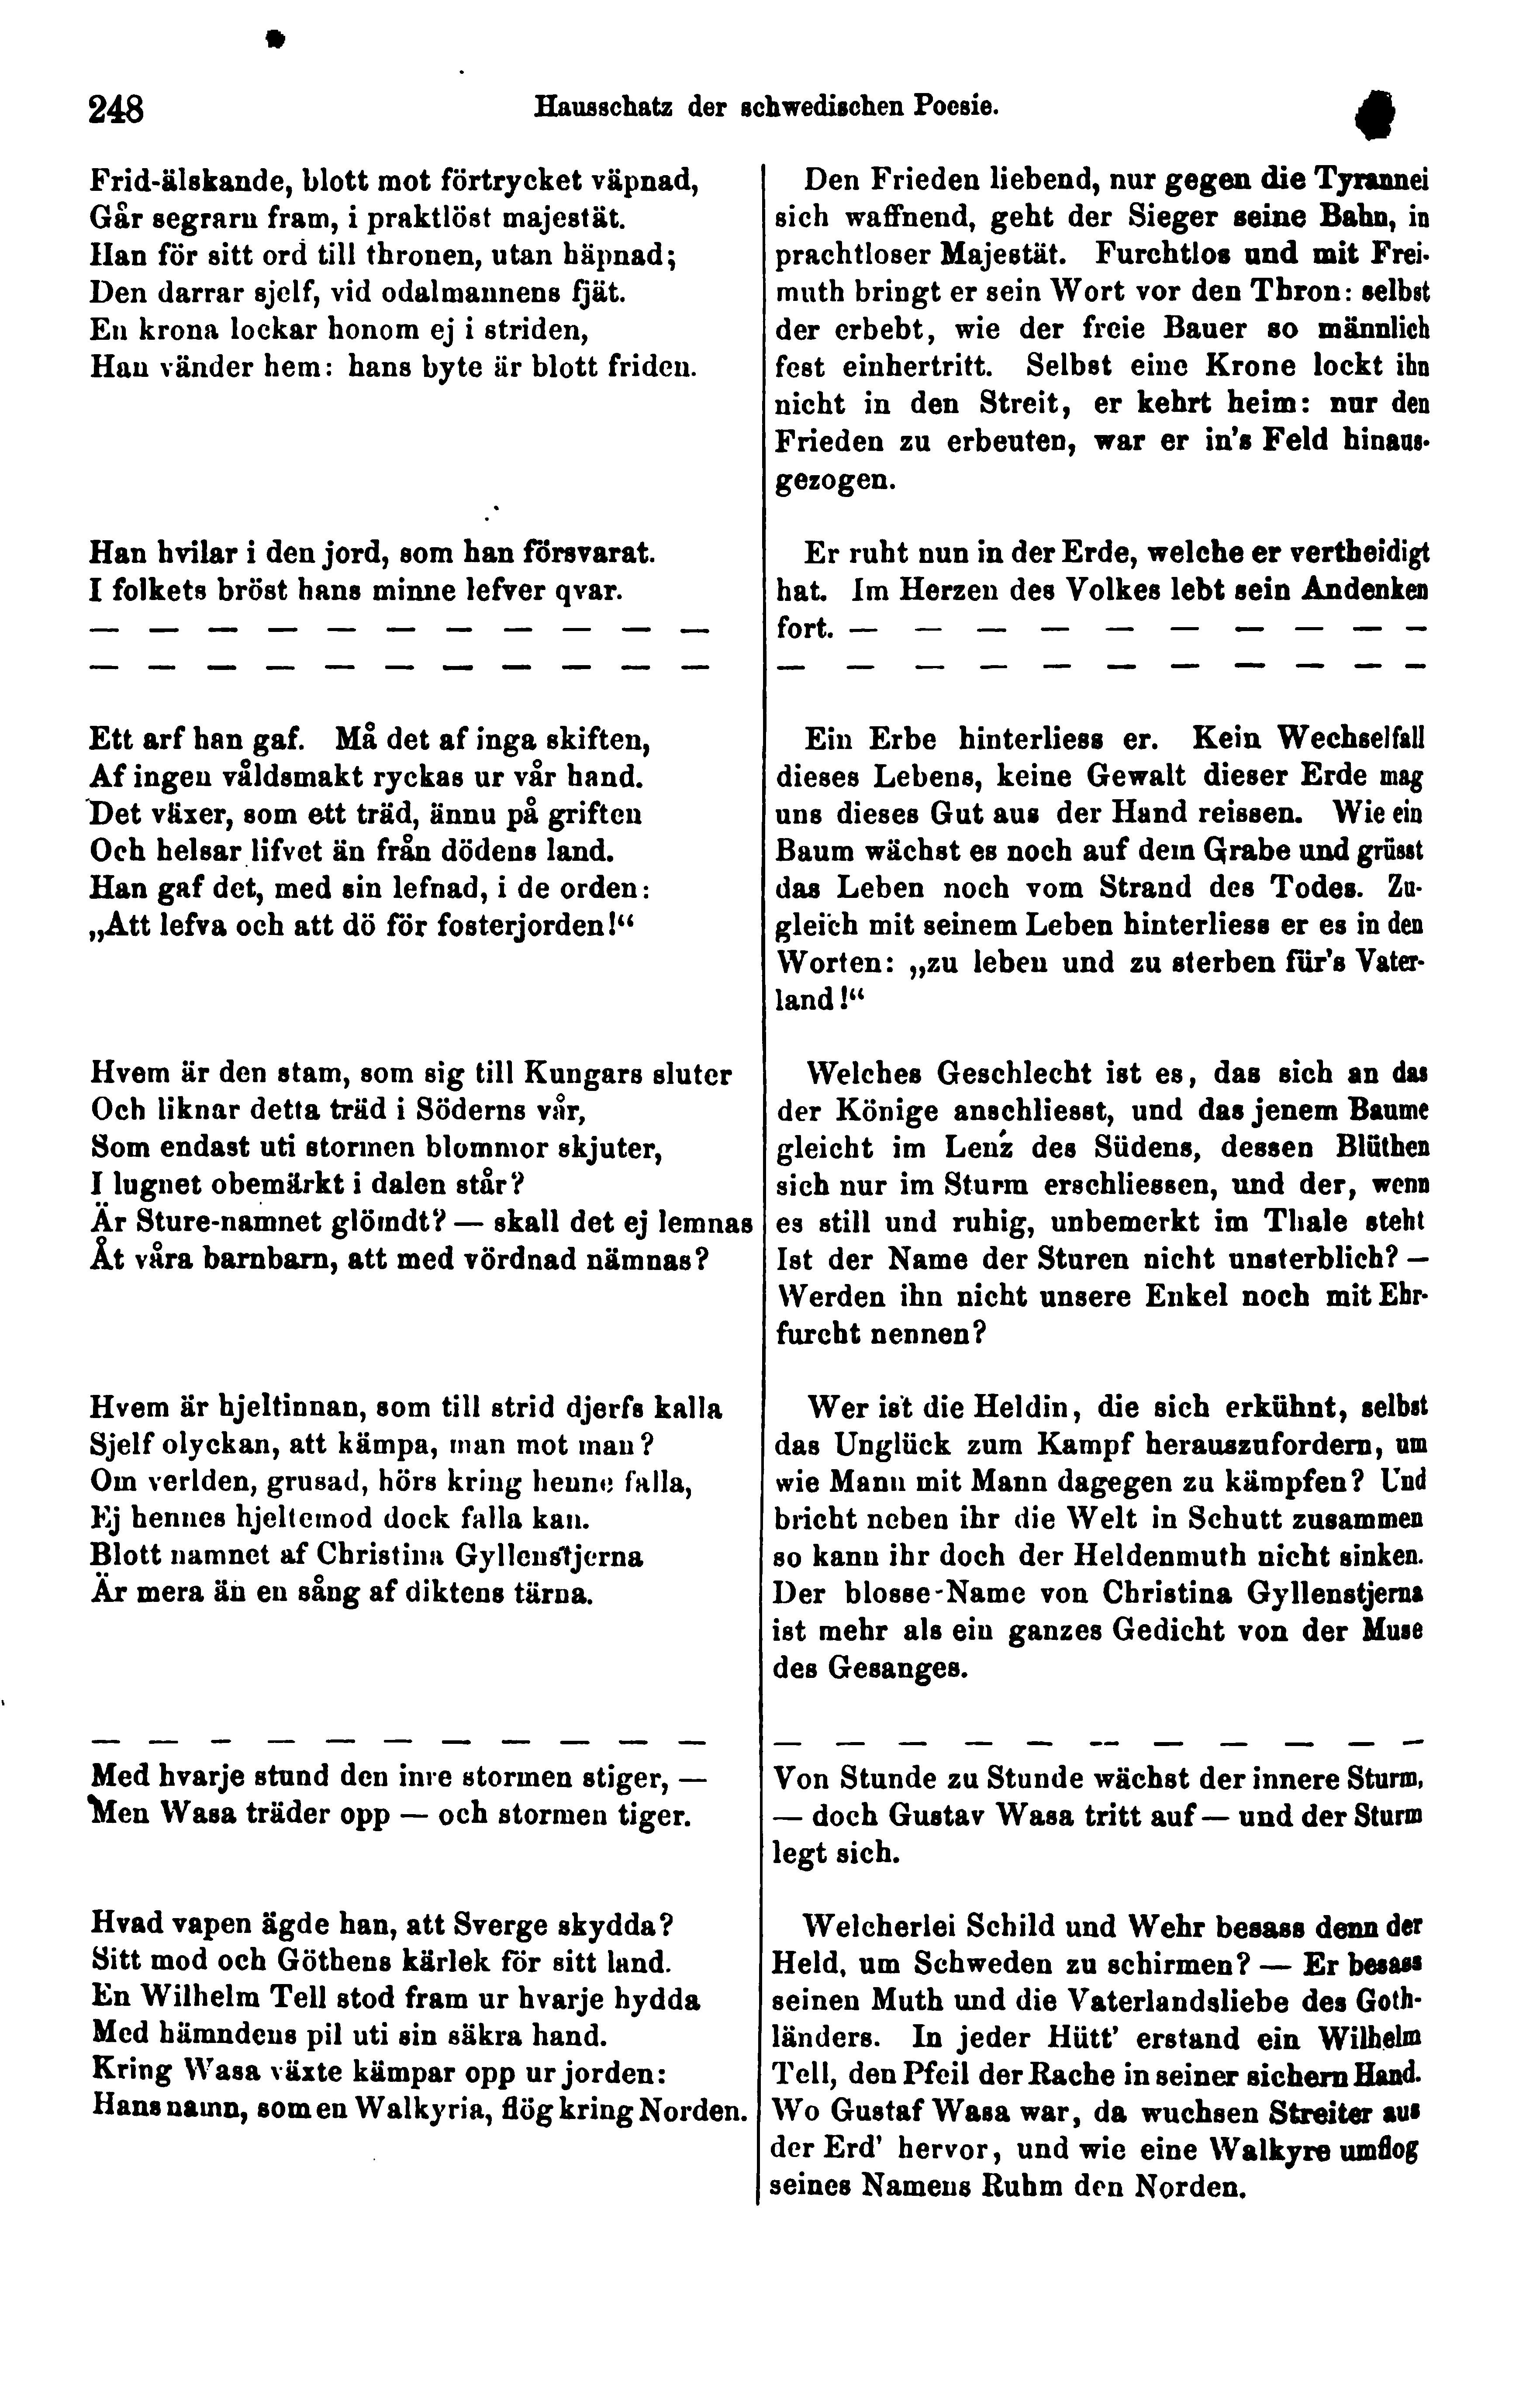 File:De Hausschatz der schwedischen Poesie 248.jpg - Wikimedia Commons